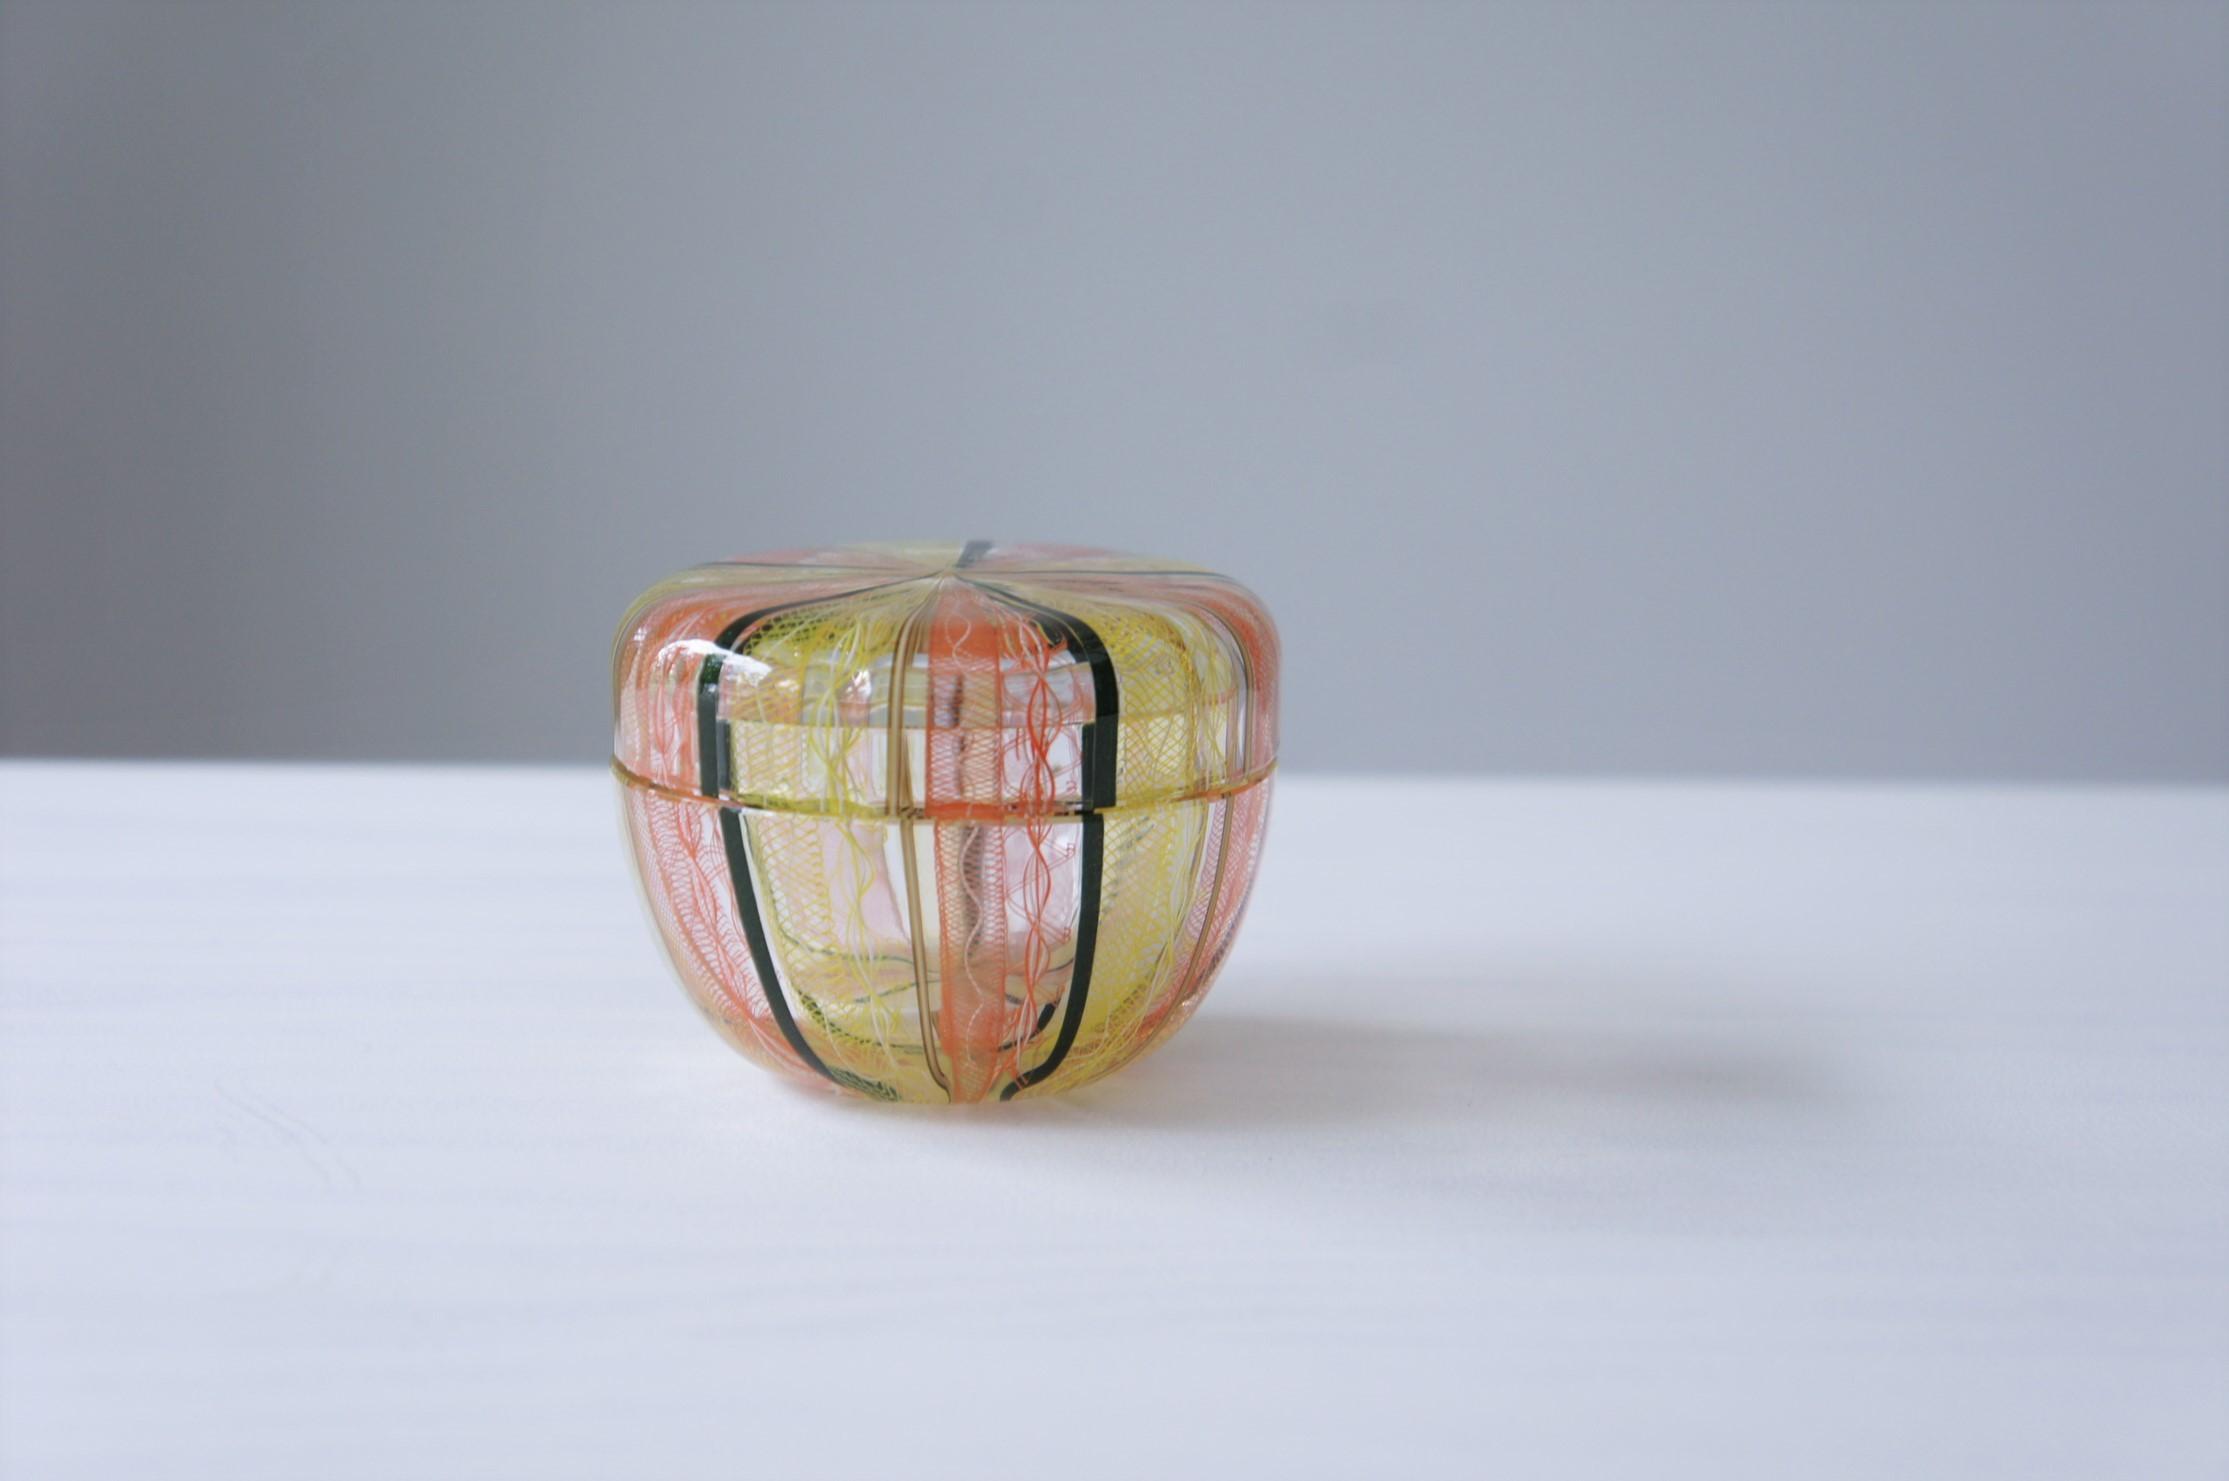 Luccichii展出品作品 小西潮さんの 橘 なつめ_b0353974_22240057.jpg